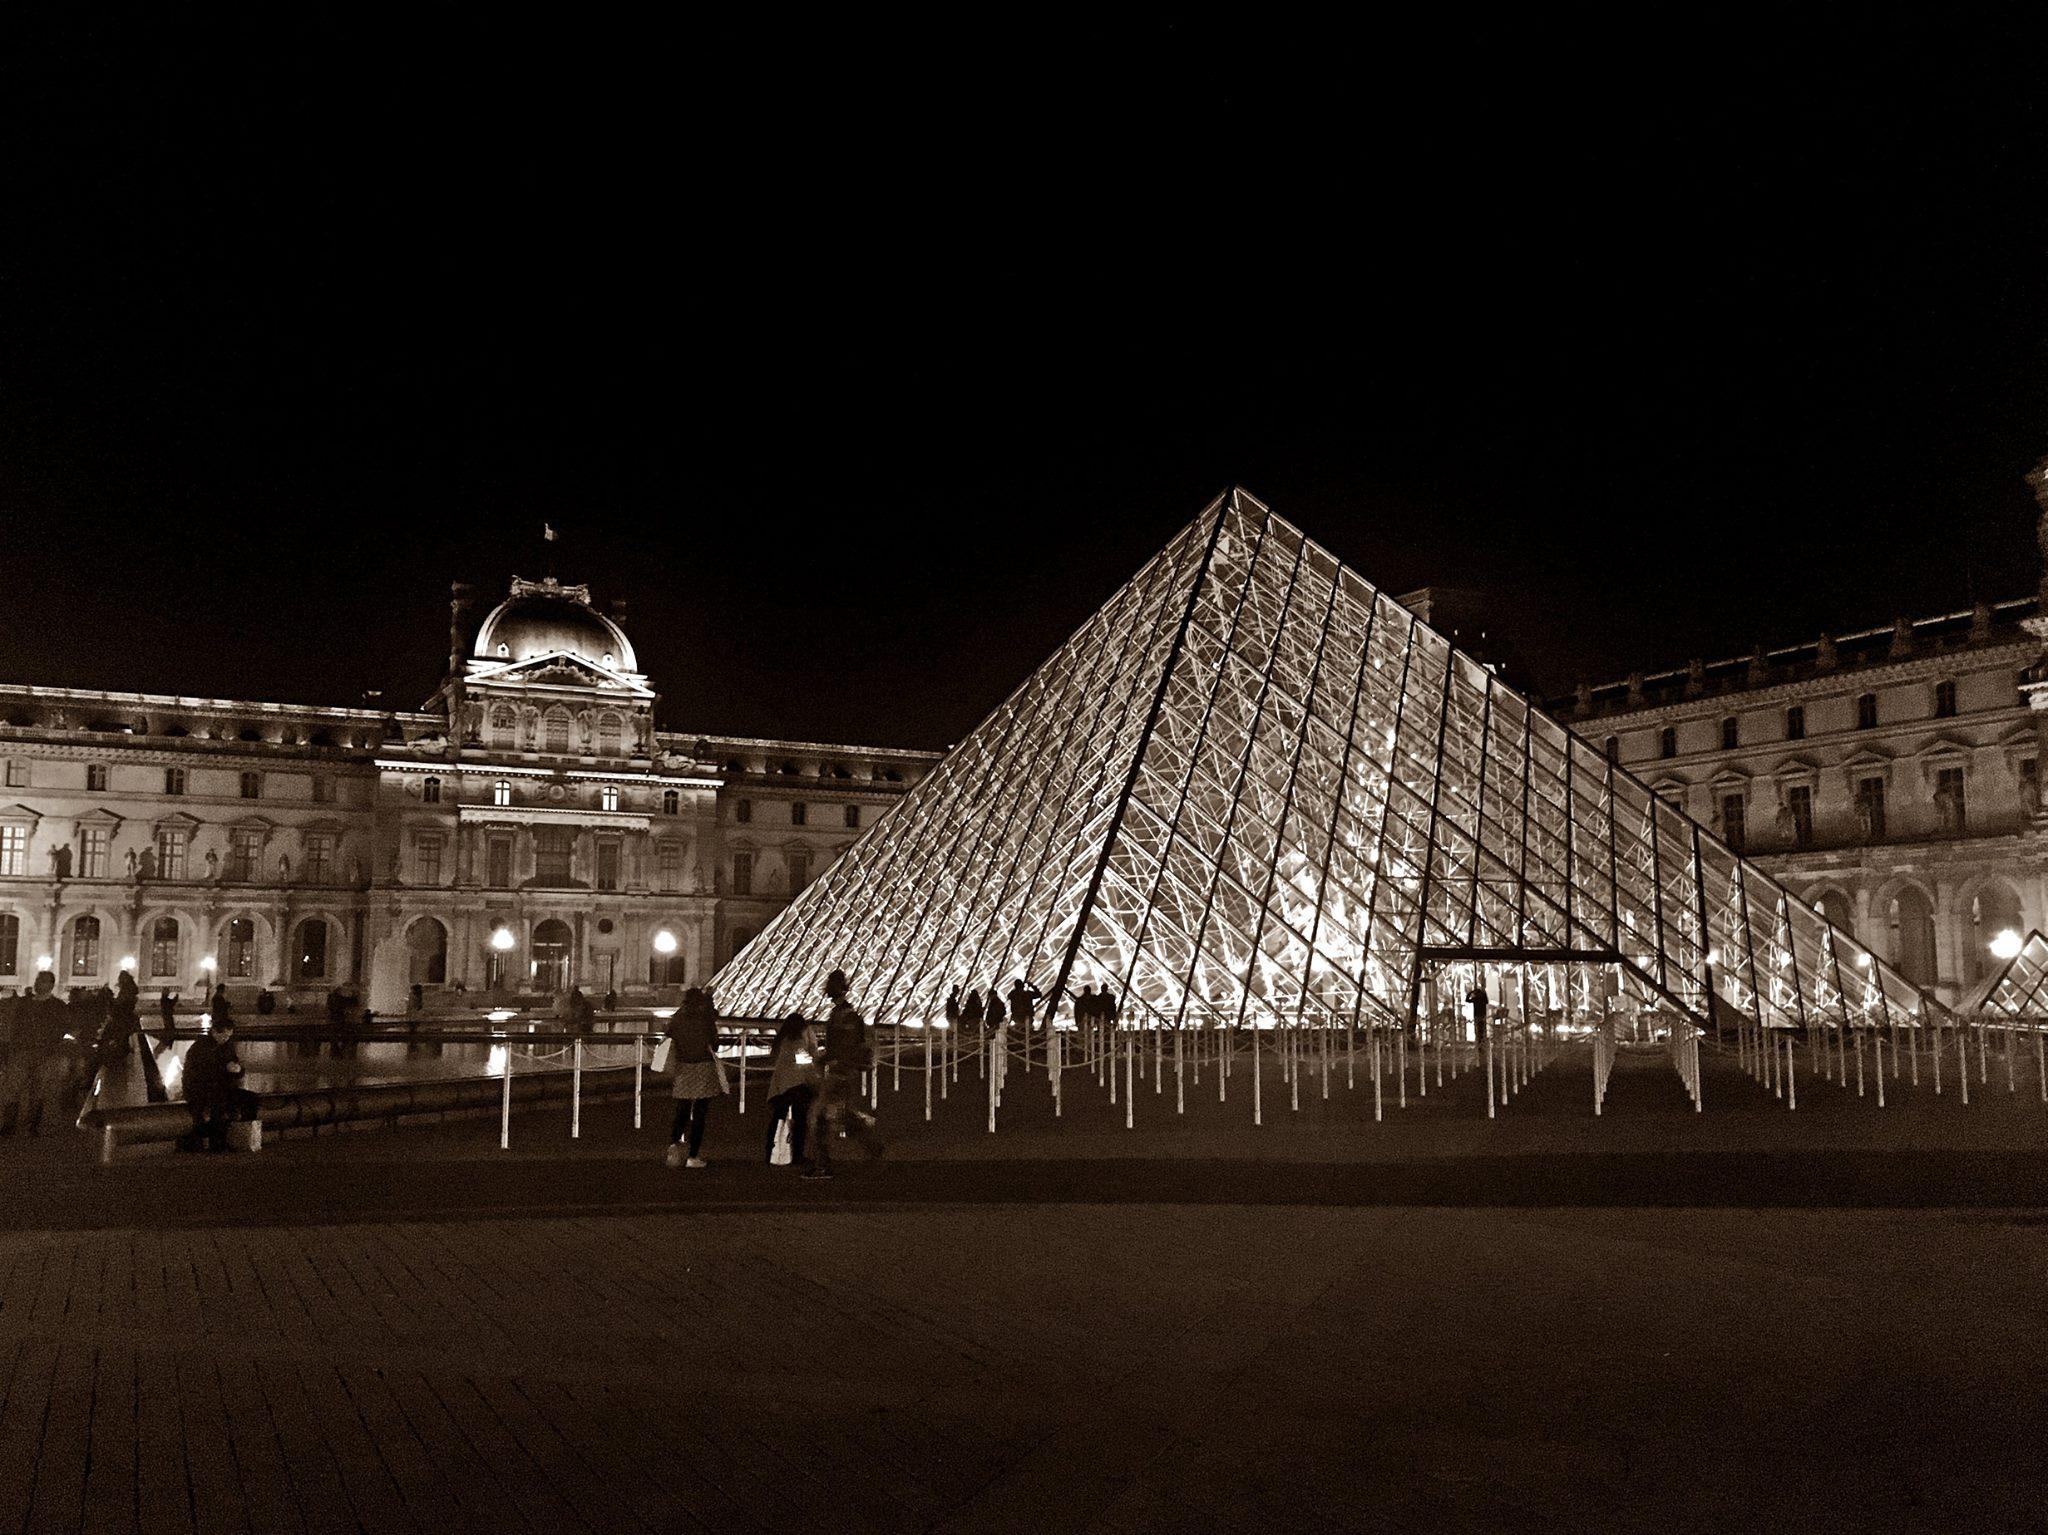 jermpins Pyramide du Louvre at night, Paris